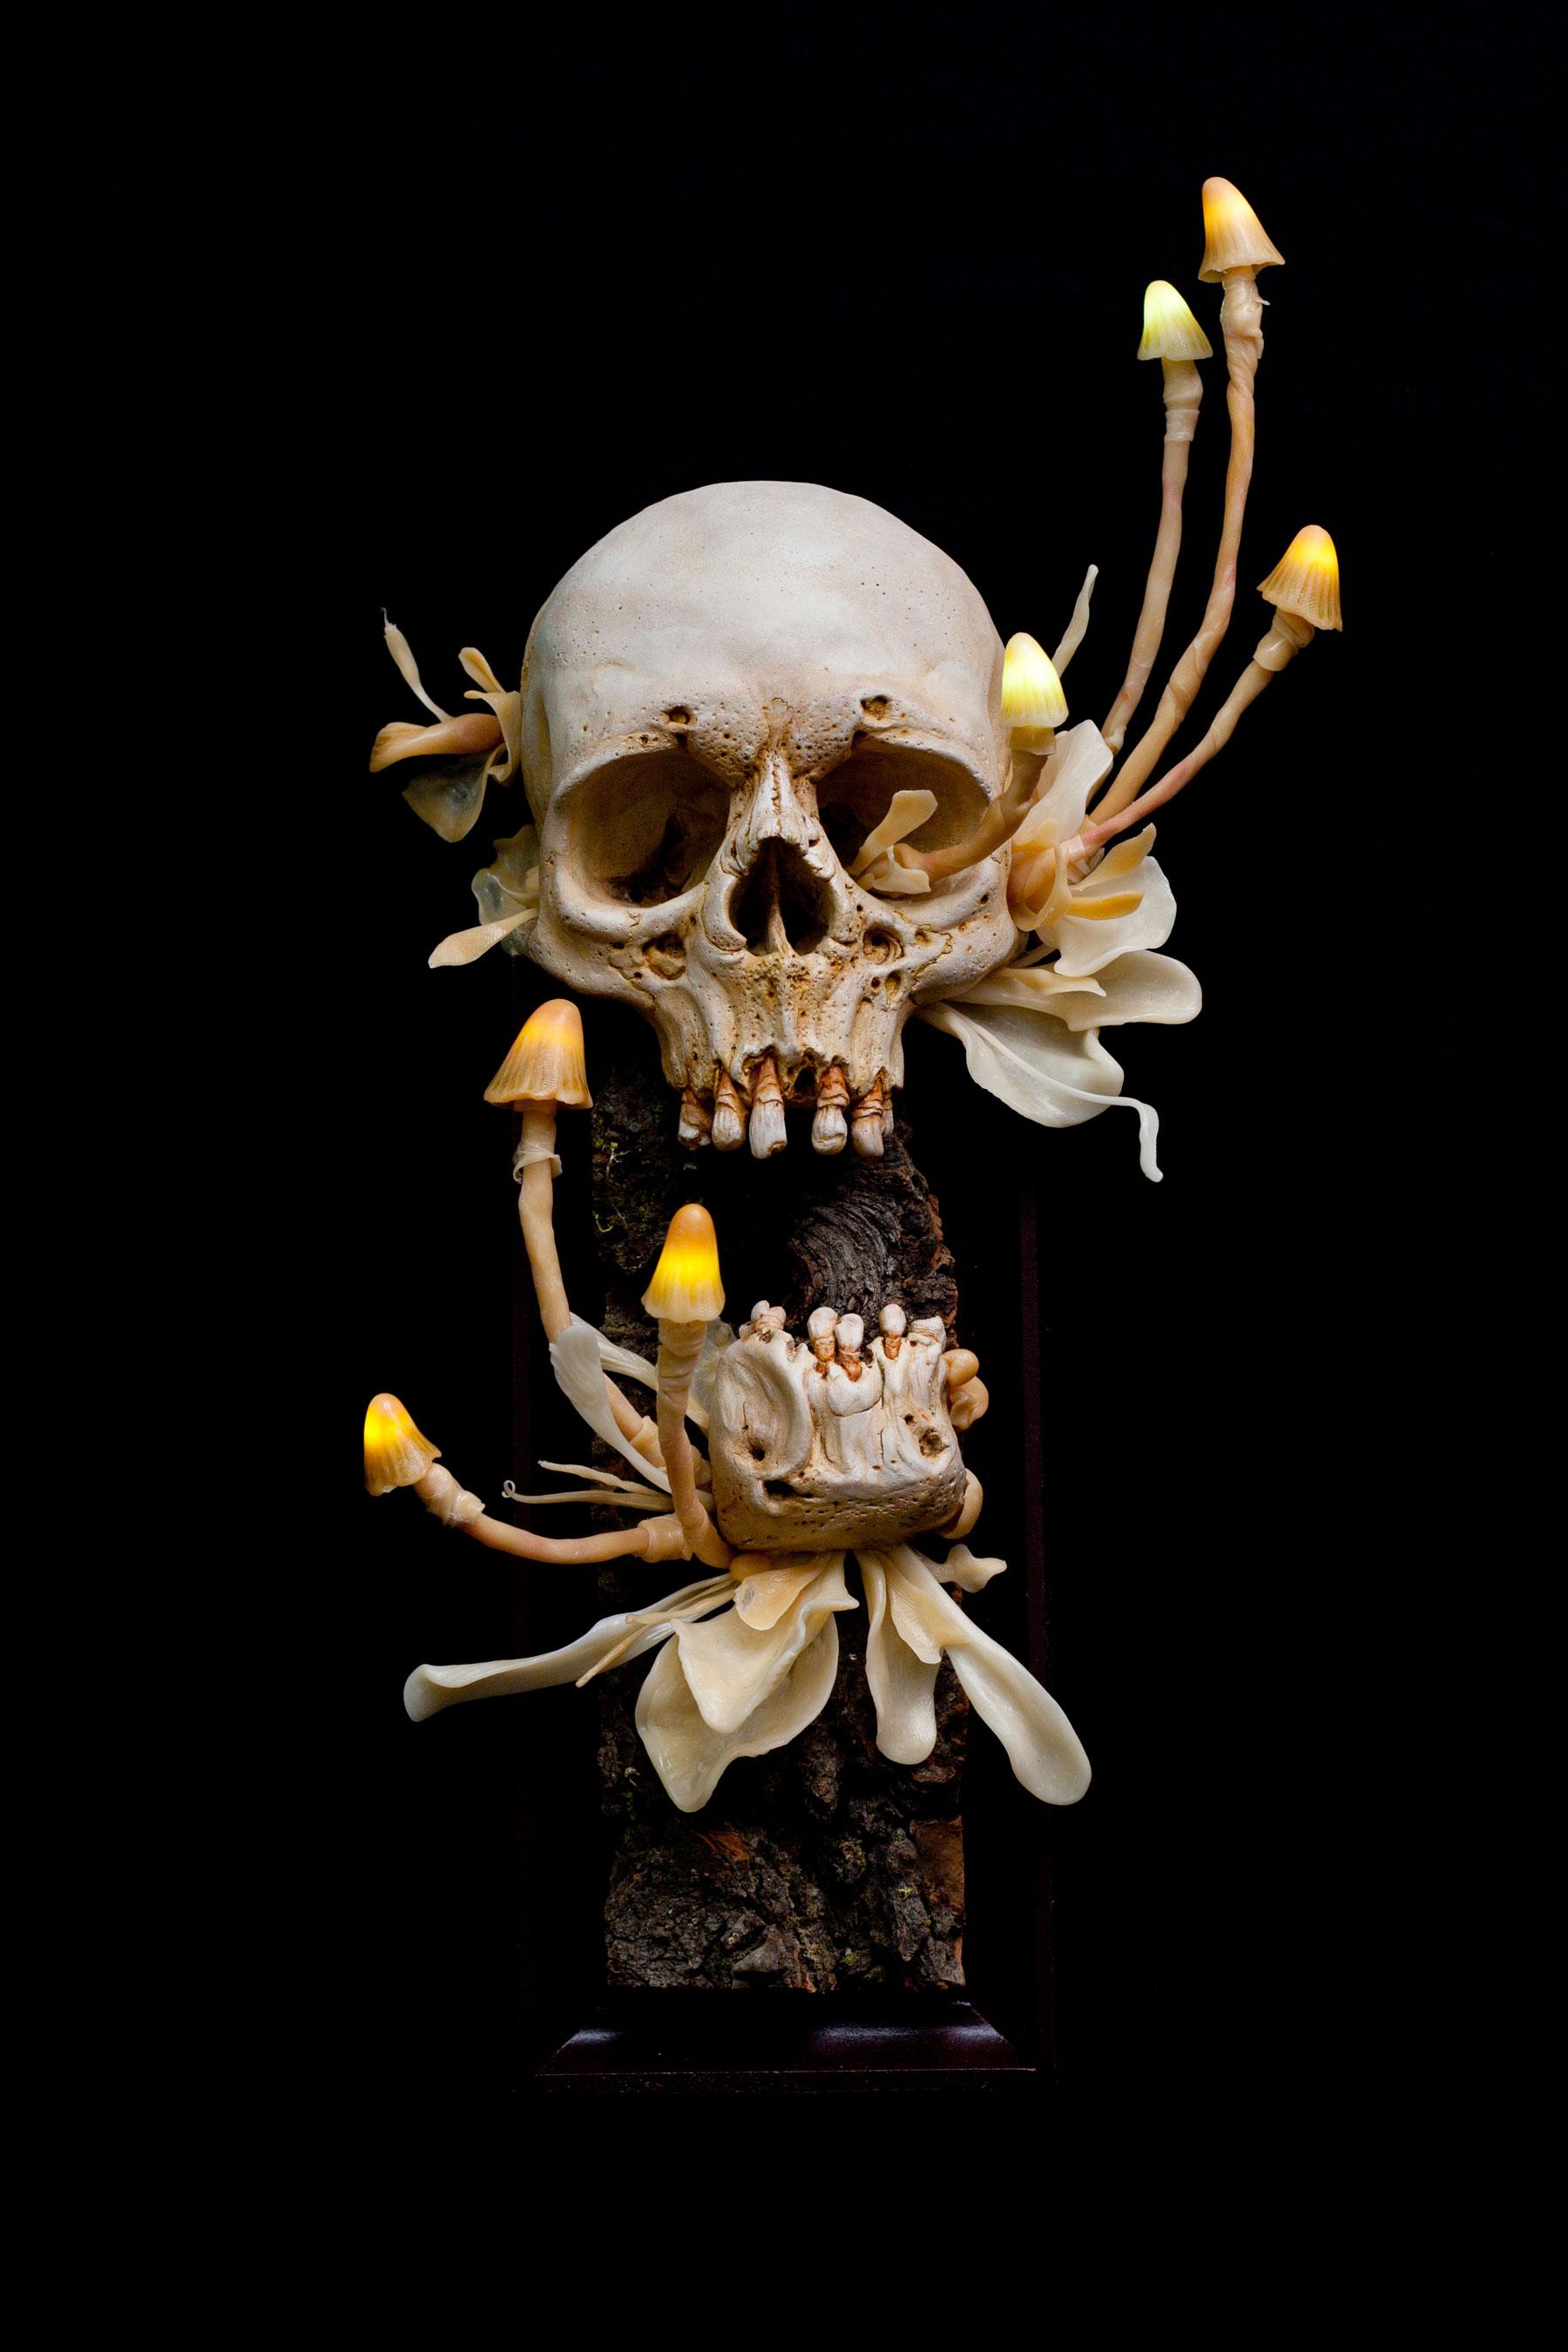 "Untitled (Sconce).  2015 - epoxy clay, plastic, wood, LED lights. 13"" x 6.5""."